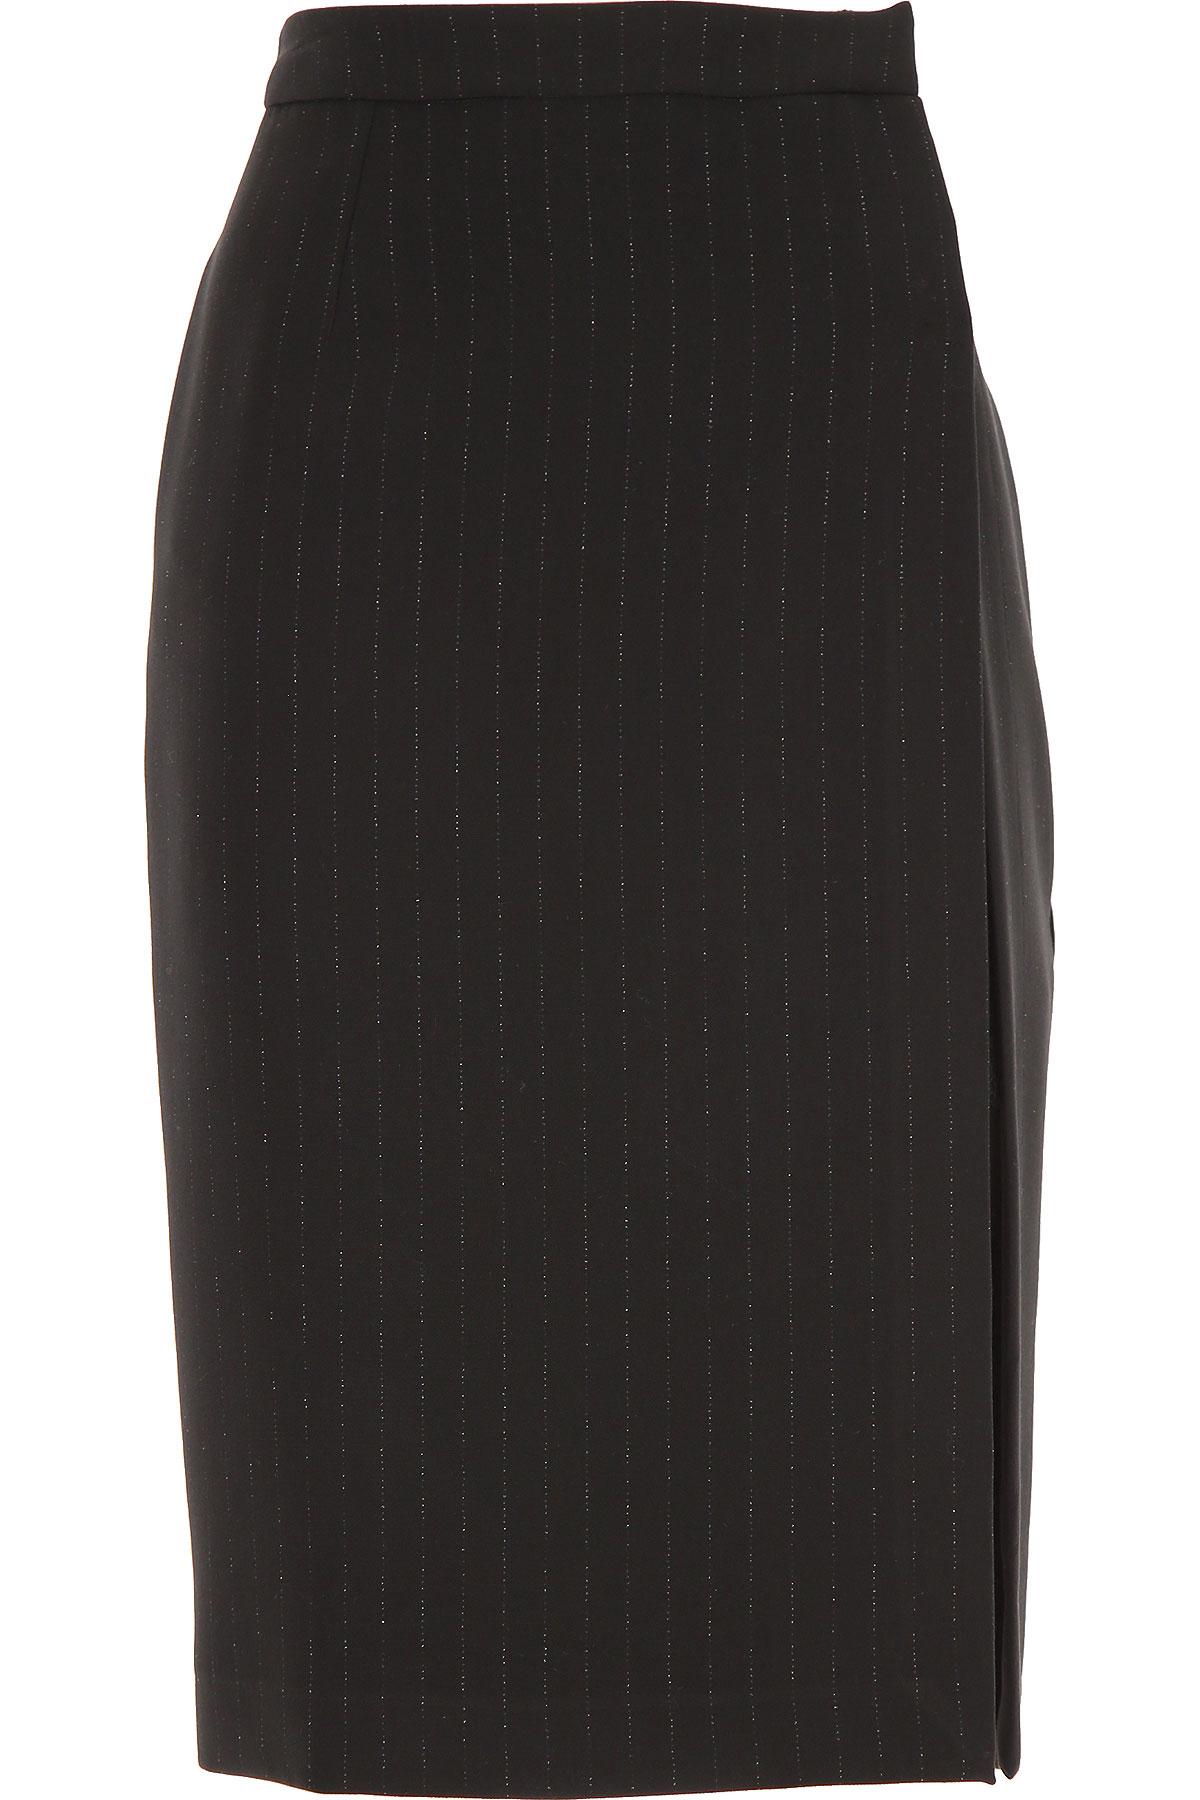 Ermanno Scervino Skirt for Women On Sale, Black, polyester, 2019, 4 6 8